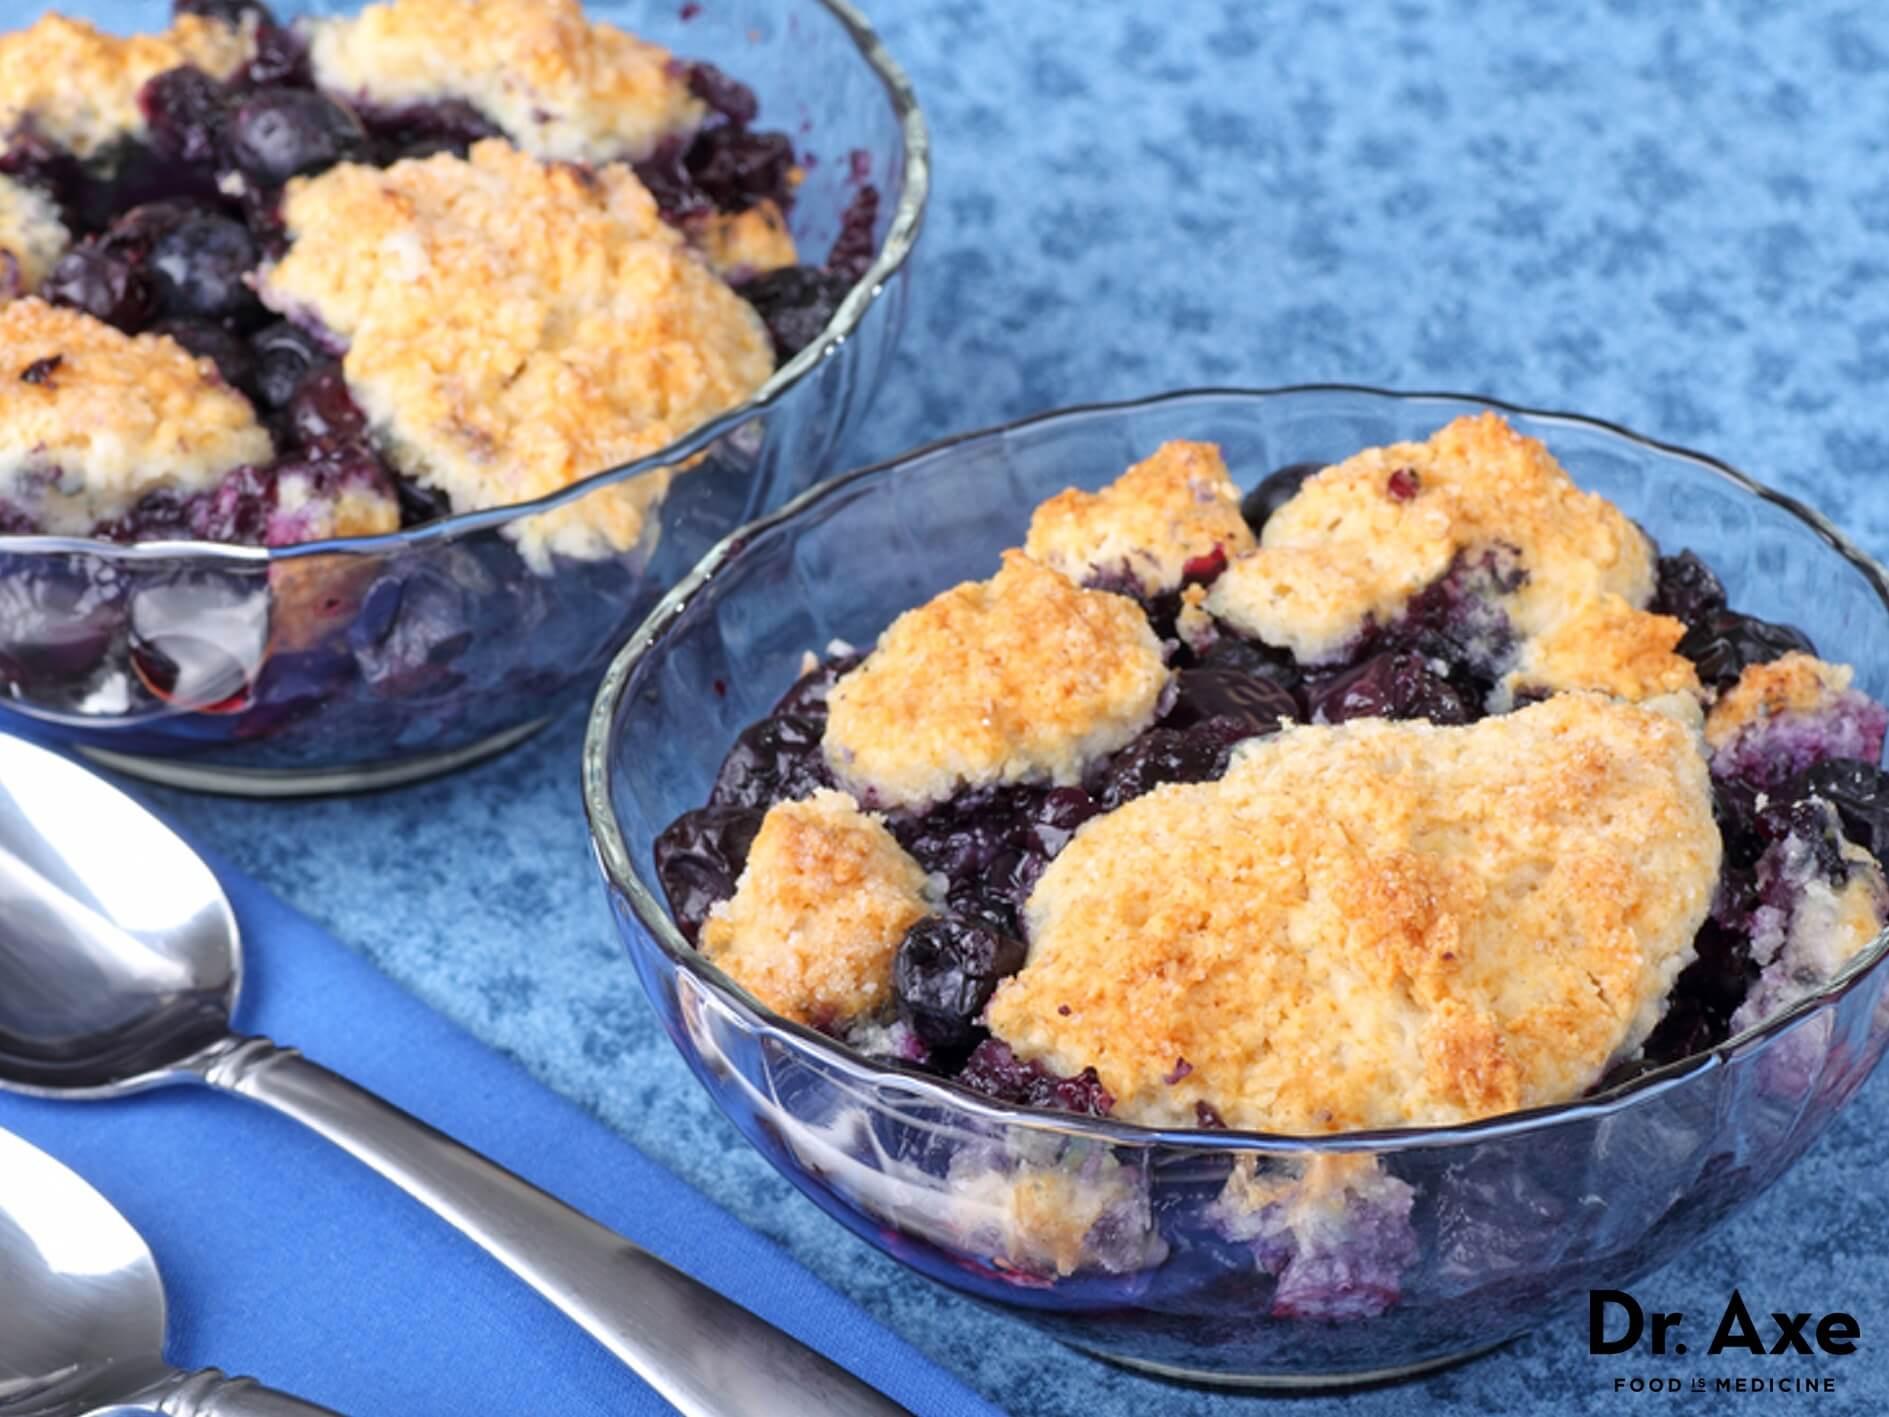 Healthy Blueberry Dessert Recipes  Healthy Blueberry Cobbler Recipe Dr Axe